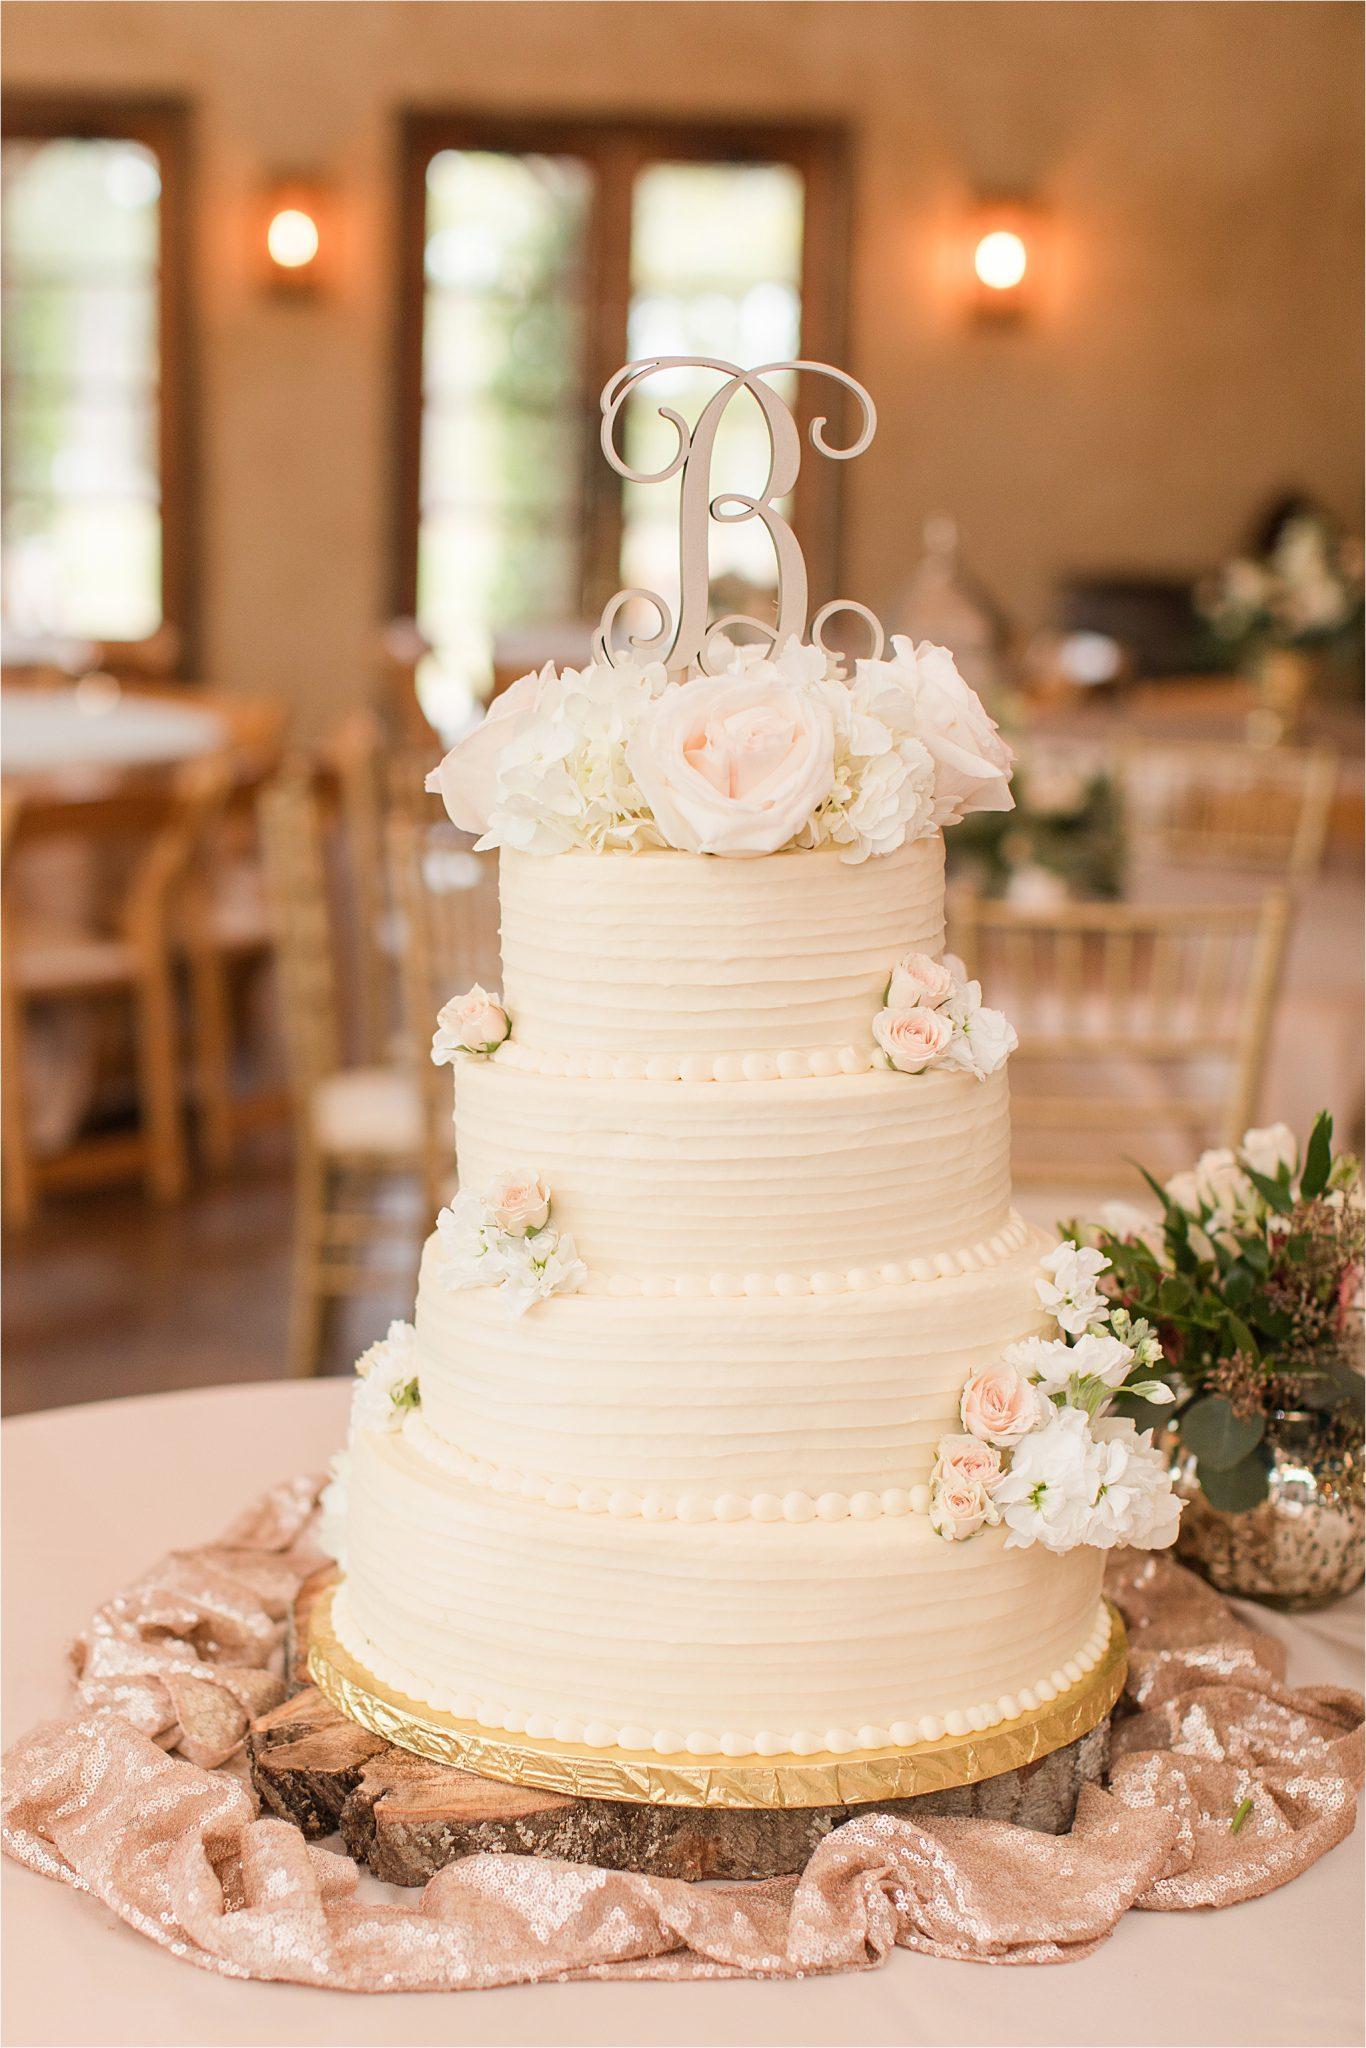 The Barn at Bridlewood Wedding-Hattiesburg, Mississippi-Kelsey + Blake-Wedding details-Barn wedding-Ruby wedding-Autumn themed wedding-Wedding detail-Wedding reception-Wedding centerpieces-Wedding cake-Wedding desserts